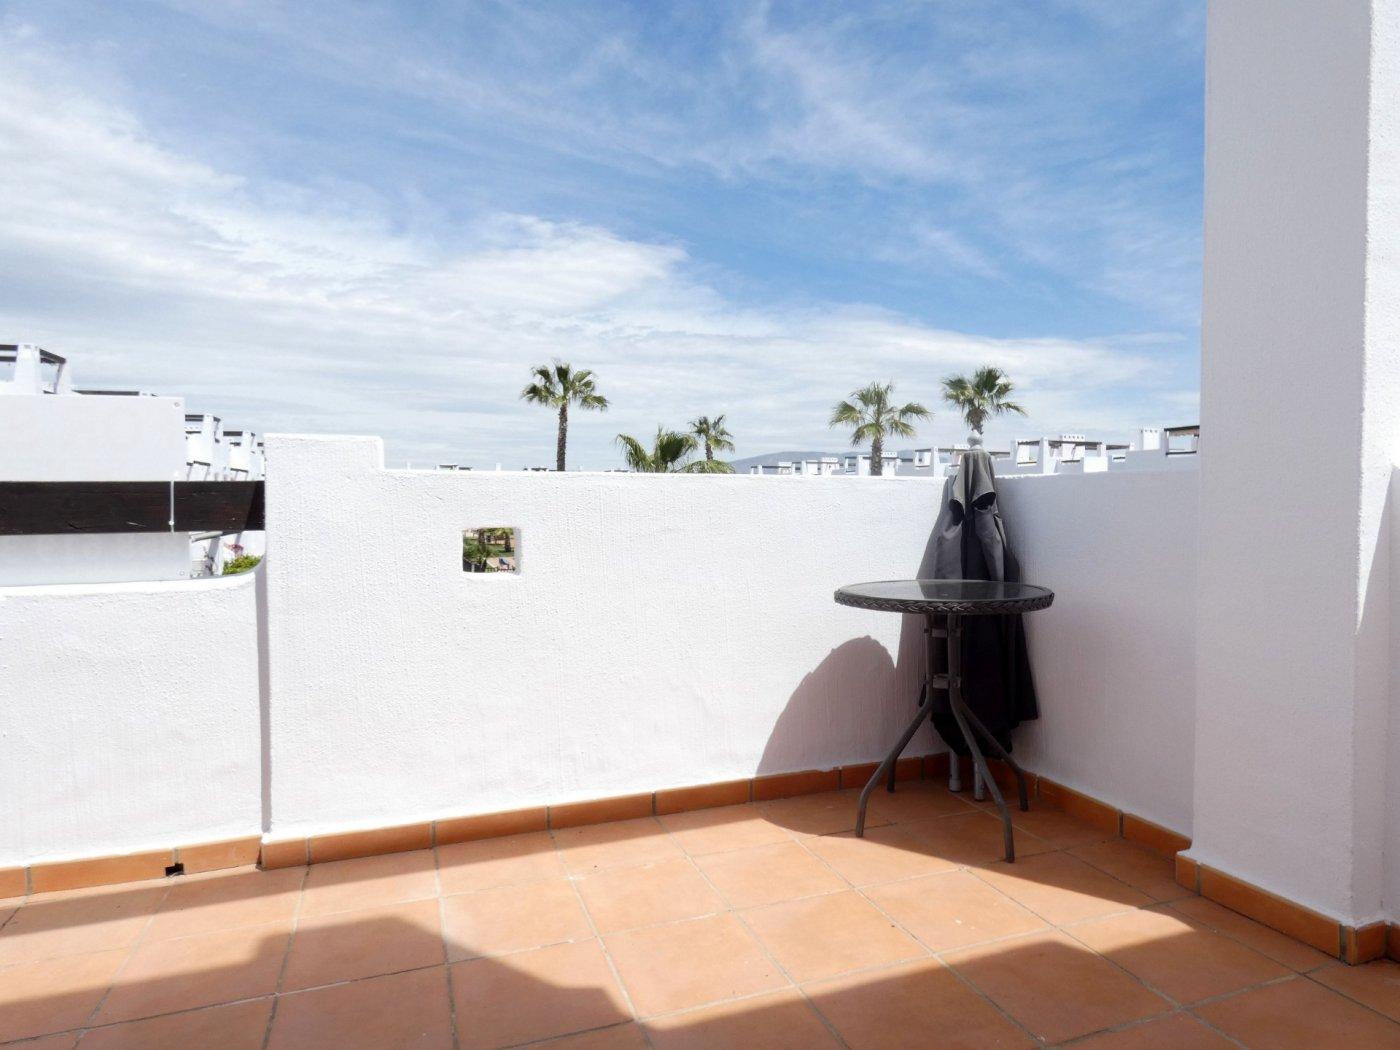 Gallery Image 33 of Key-Ready 2 Bedroom Apartment Overlooking the Citrus Groves in Jardin 10, Condado de Alhama